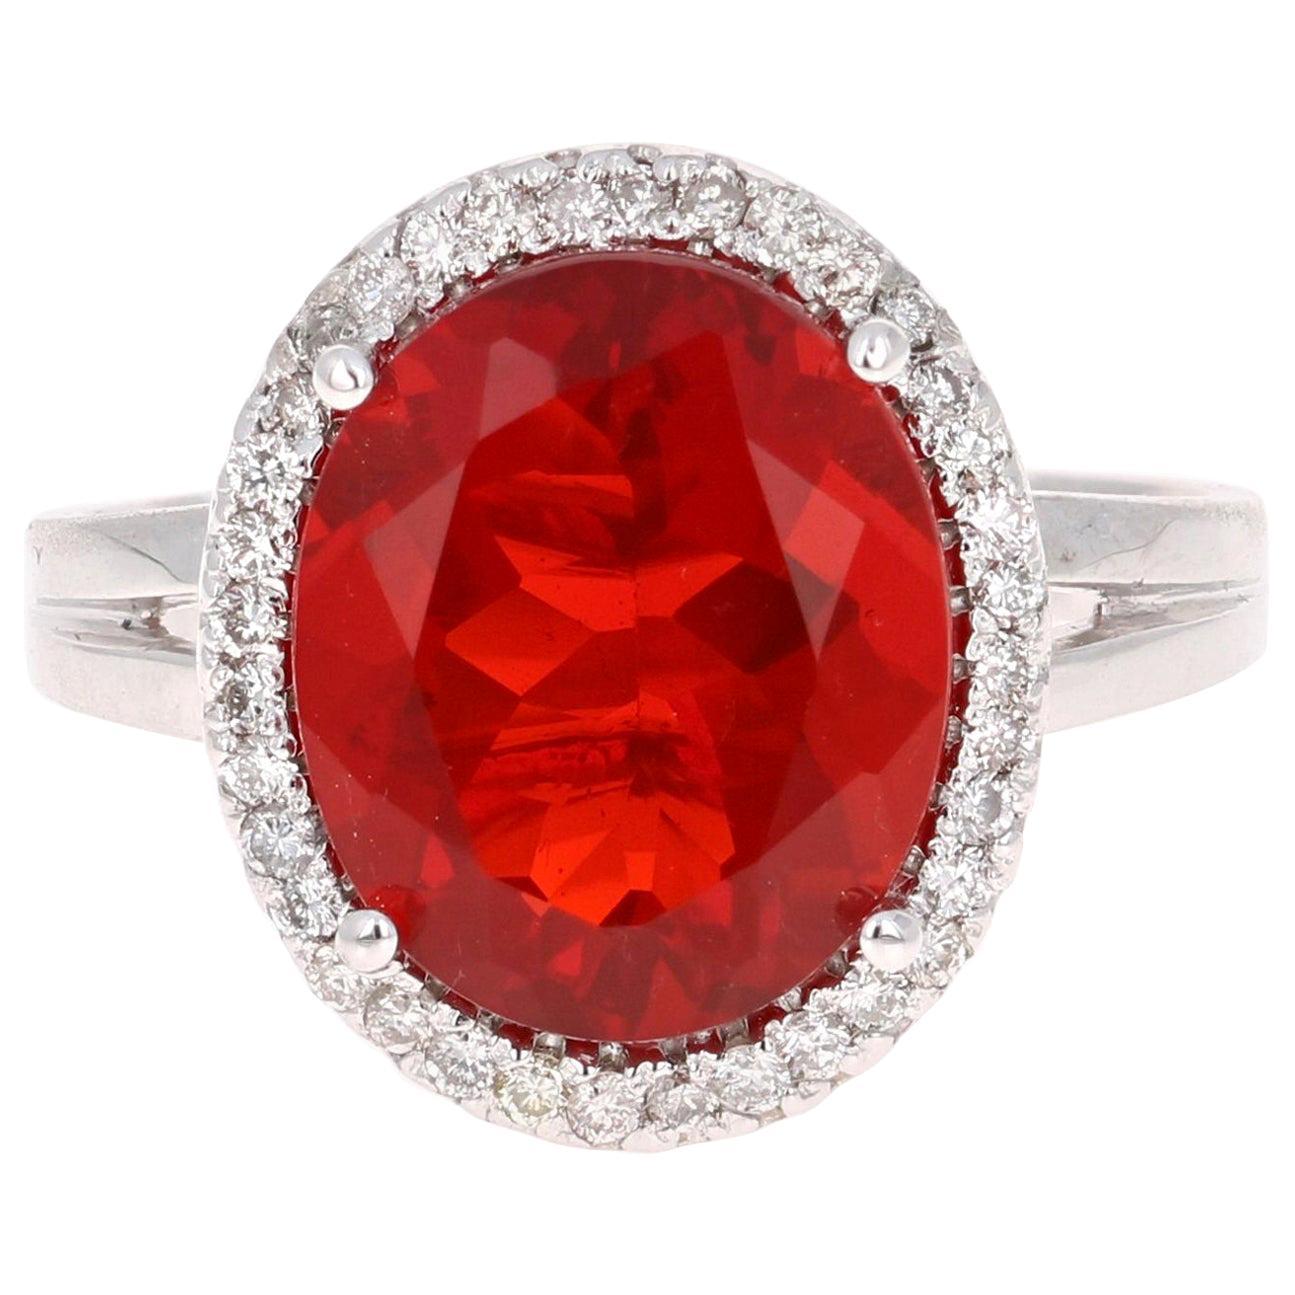 3.78 Carat Oval Cut Fire Opal Diamond 14 Karat White Gold Bridal Ring